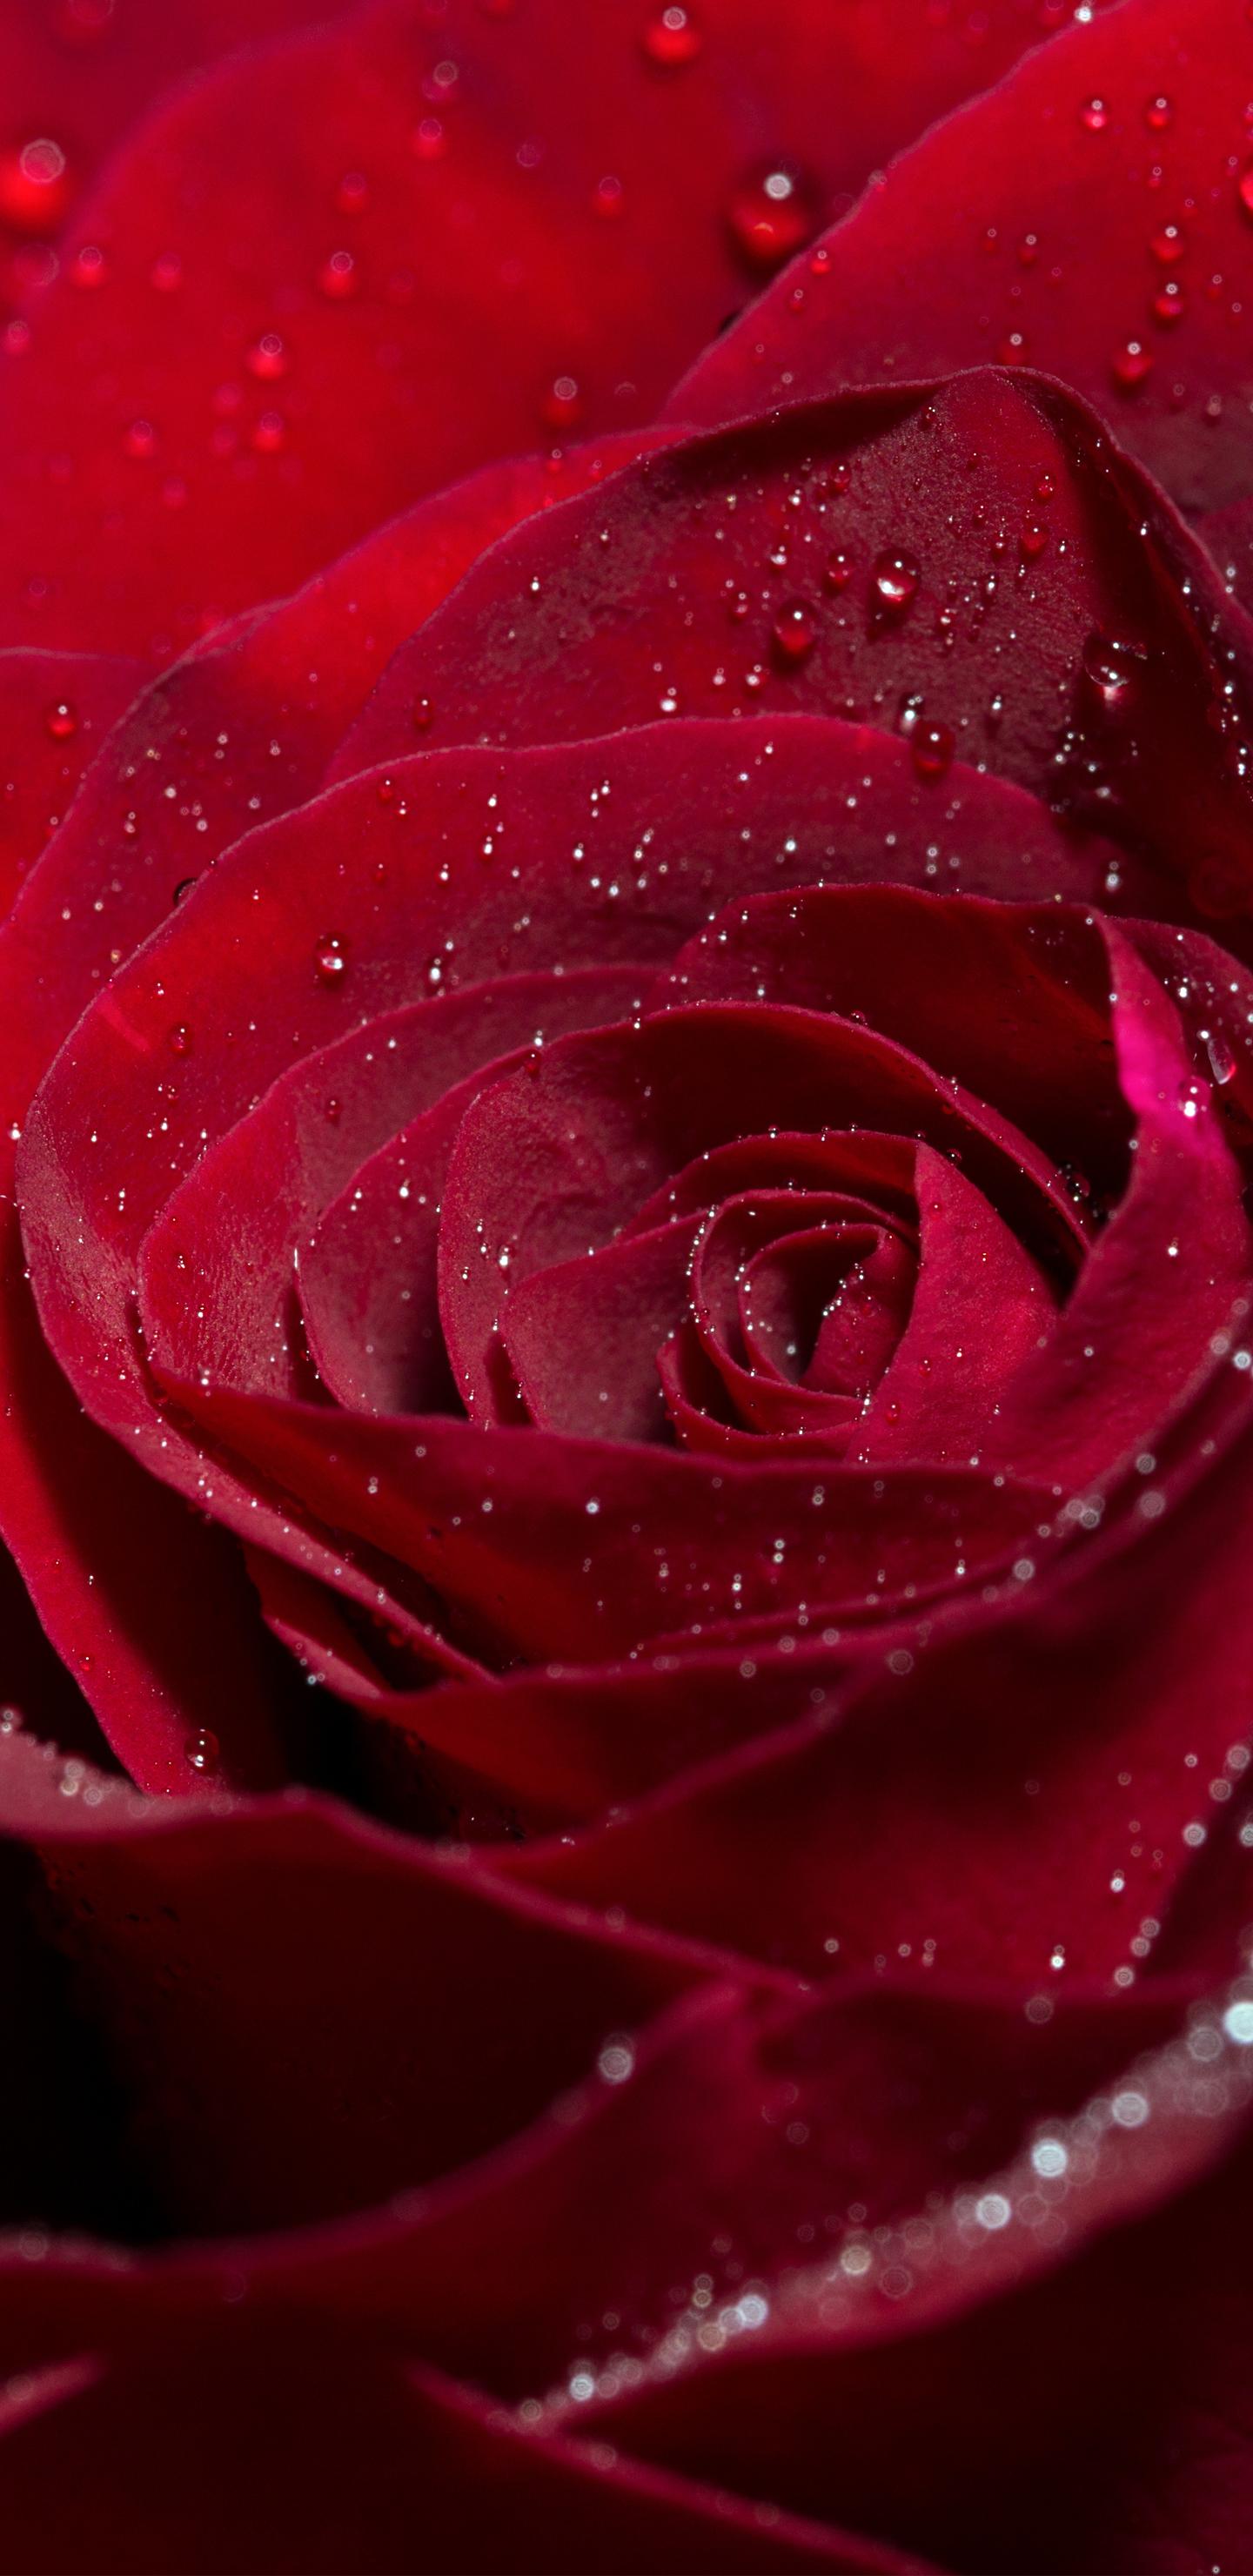 Samsung Galaxy Note8 Rose Wallpaper Gallery Yopriceville   High 1440x2960